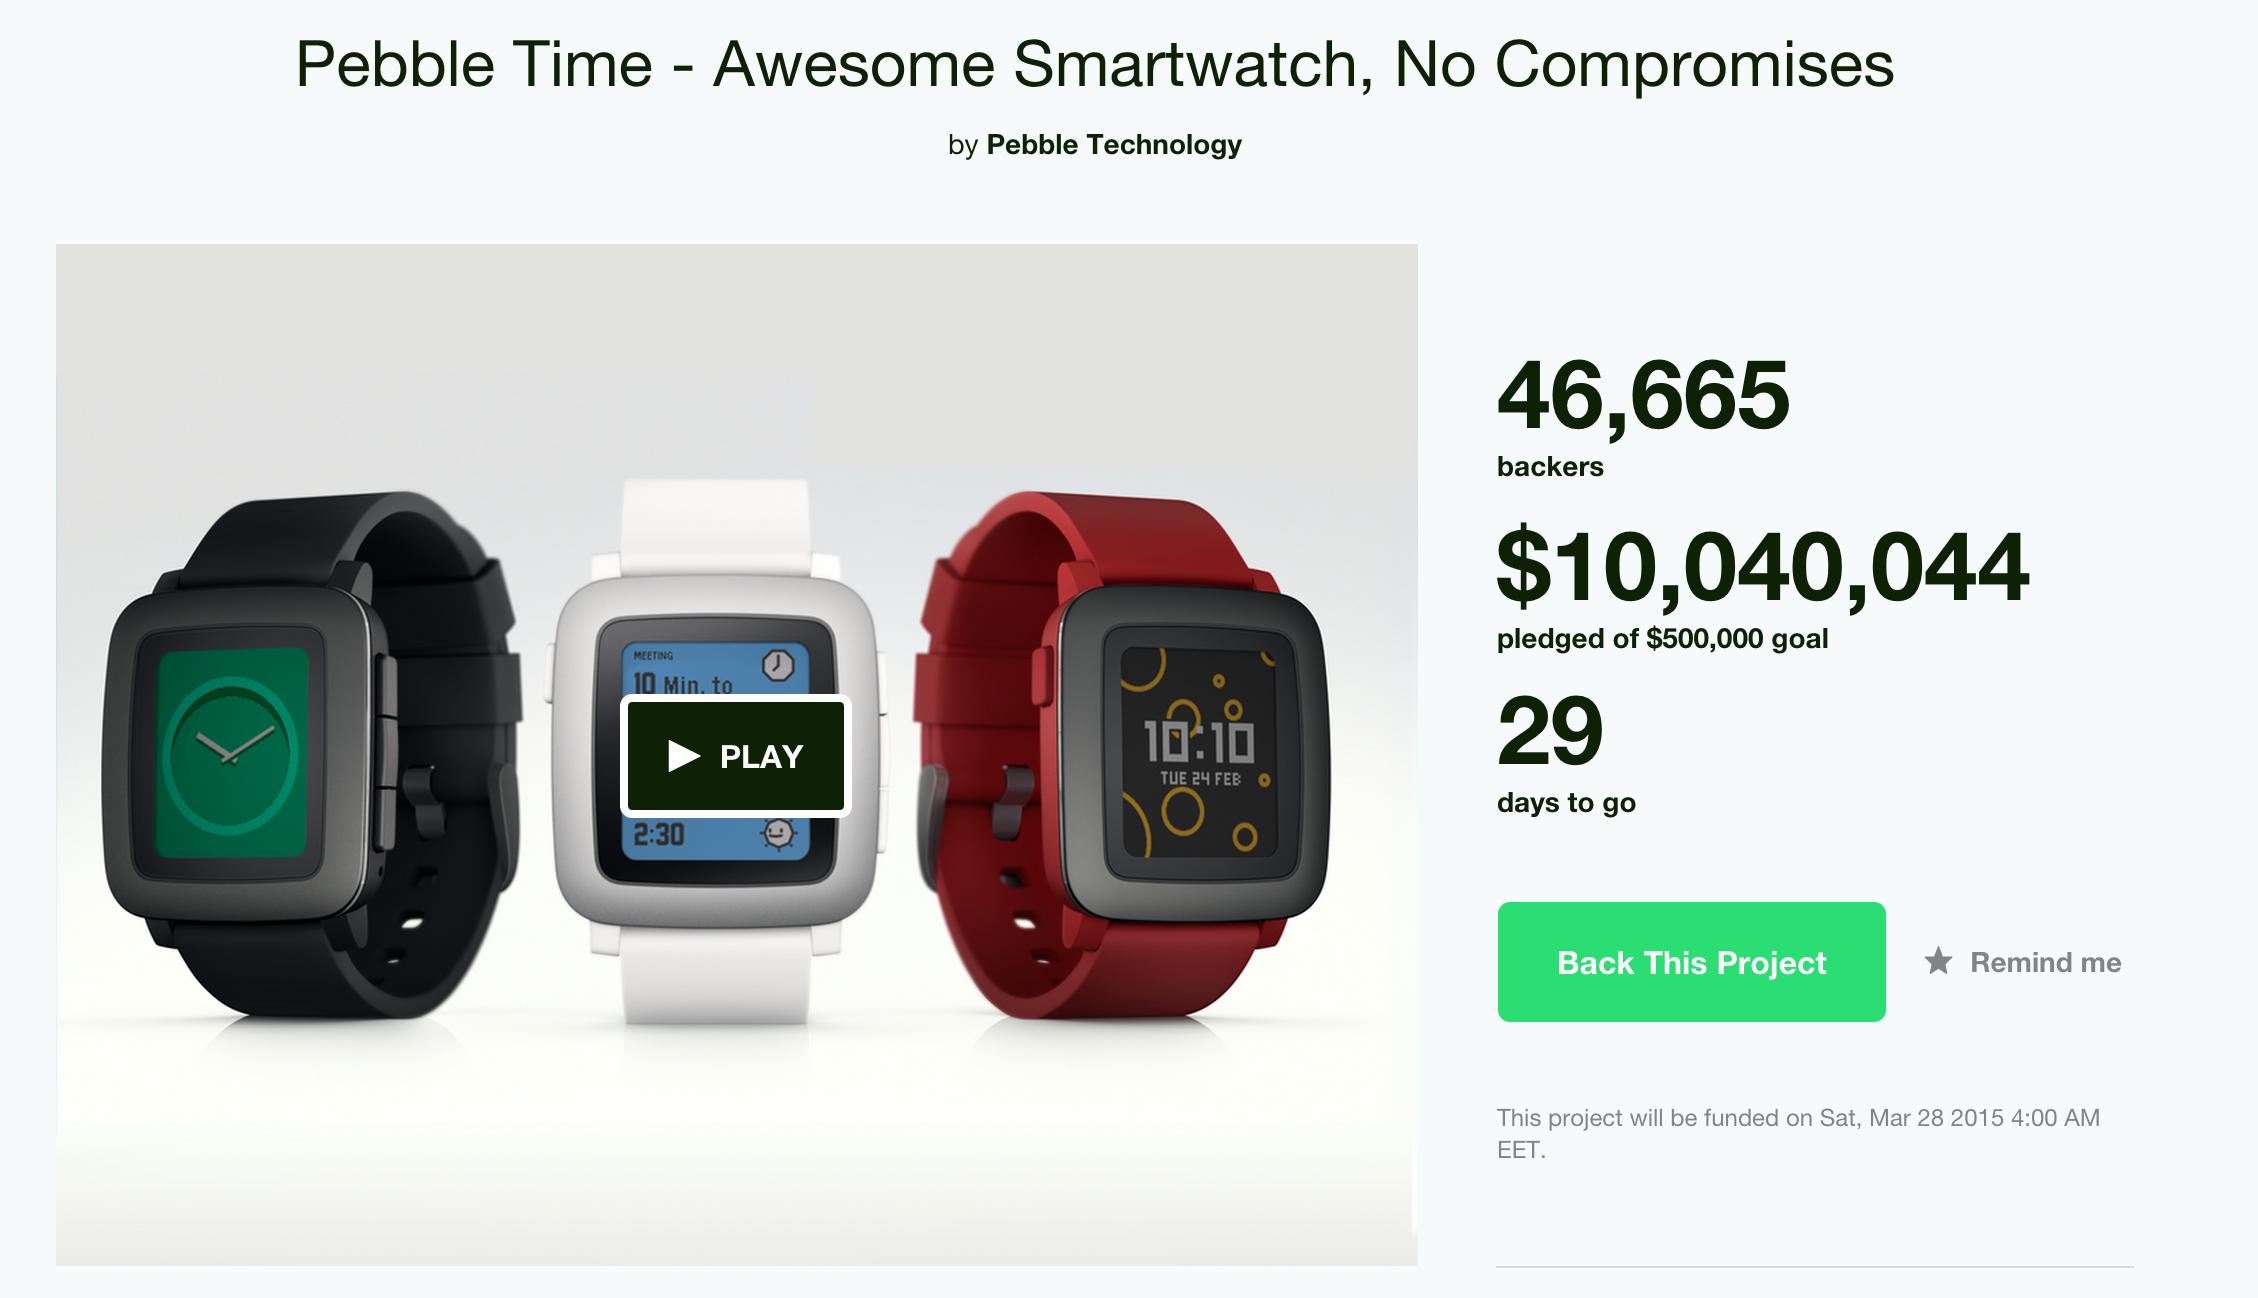 Pebble собрали на Kickstarter $10 млн за два дня